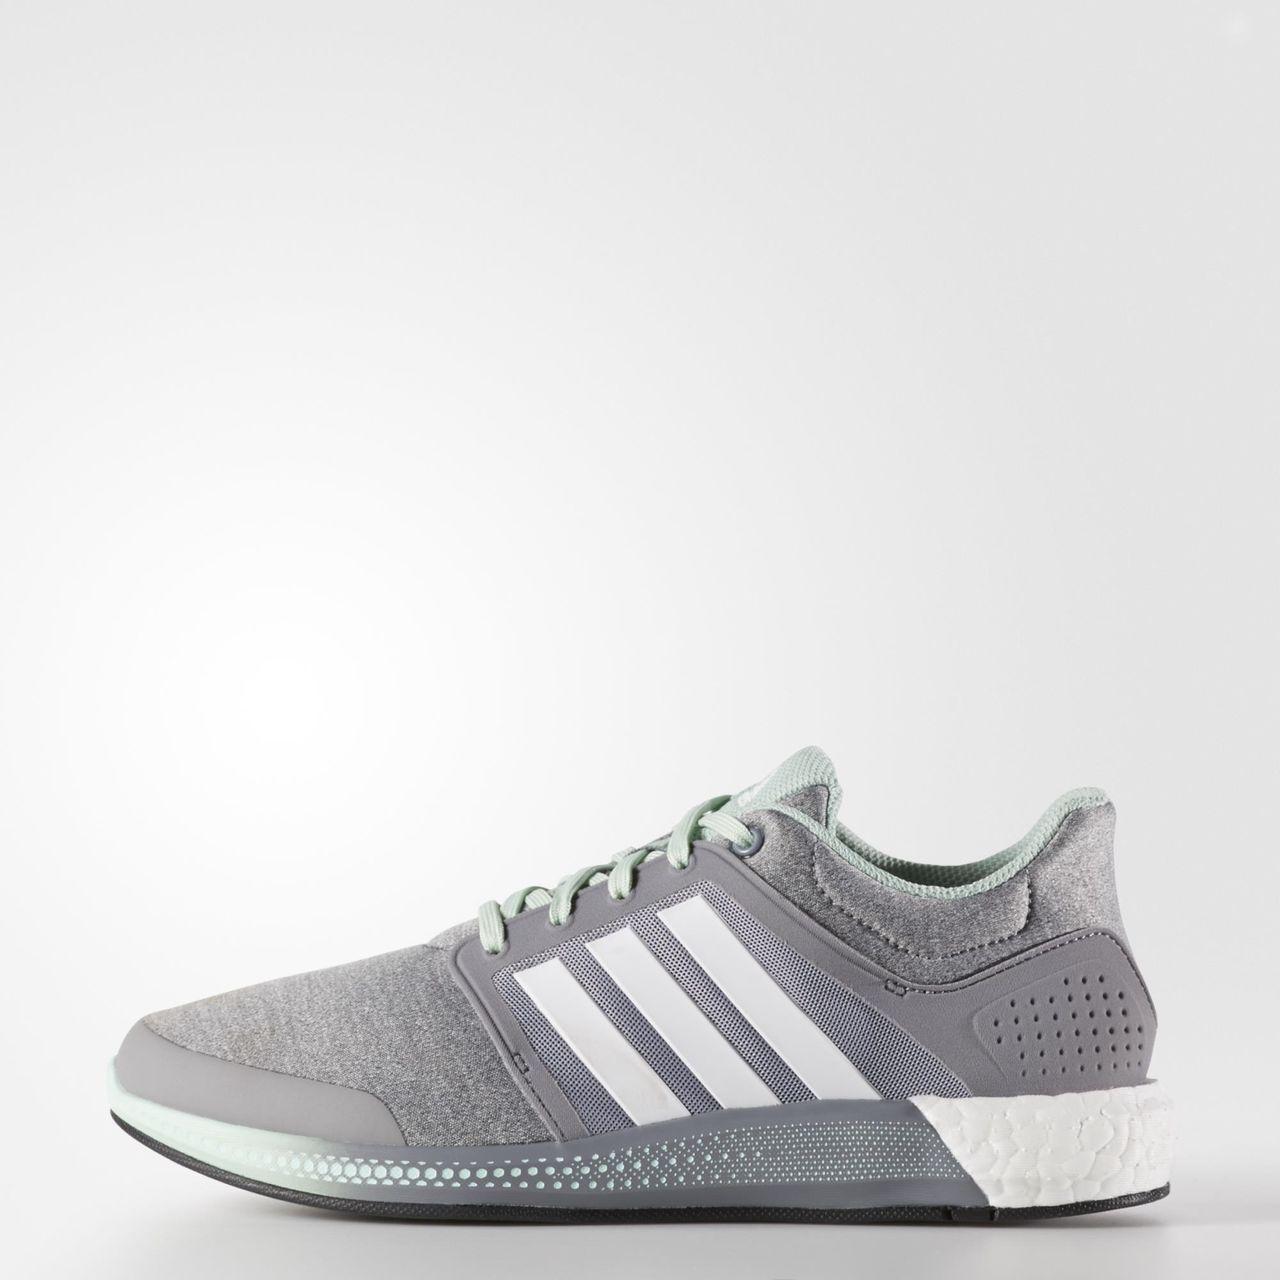 adidas solare spinta scarpe grey adidas stronzi mi piacerebbe